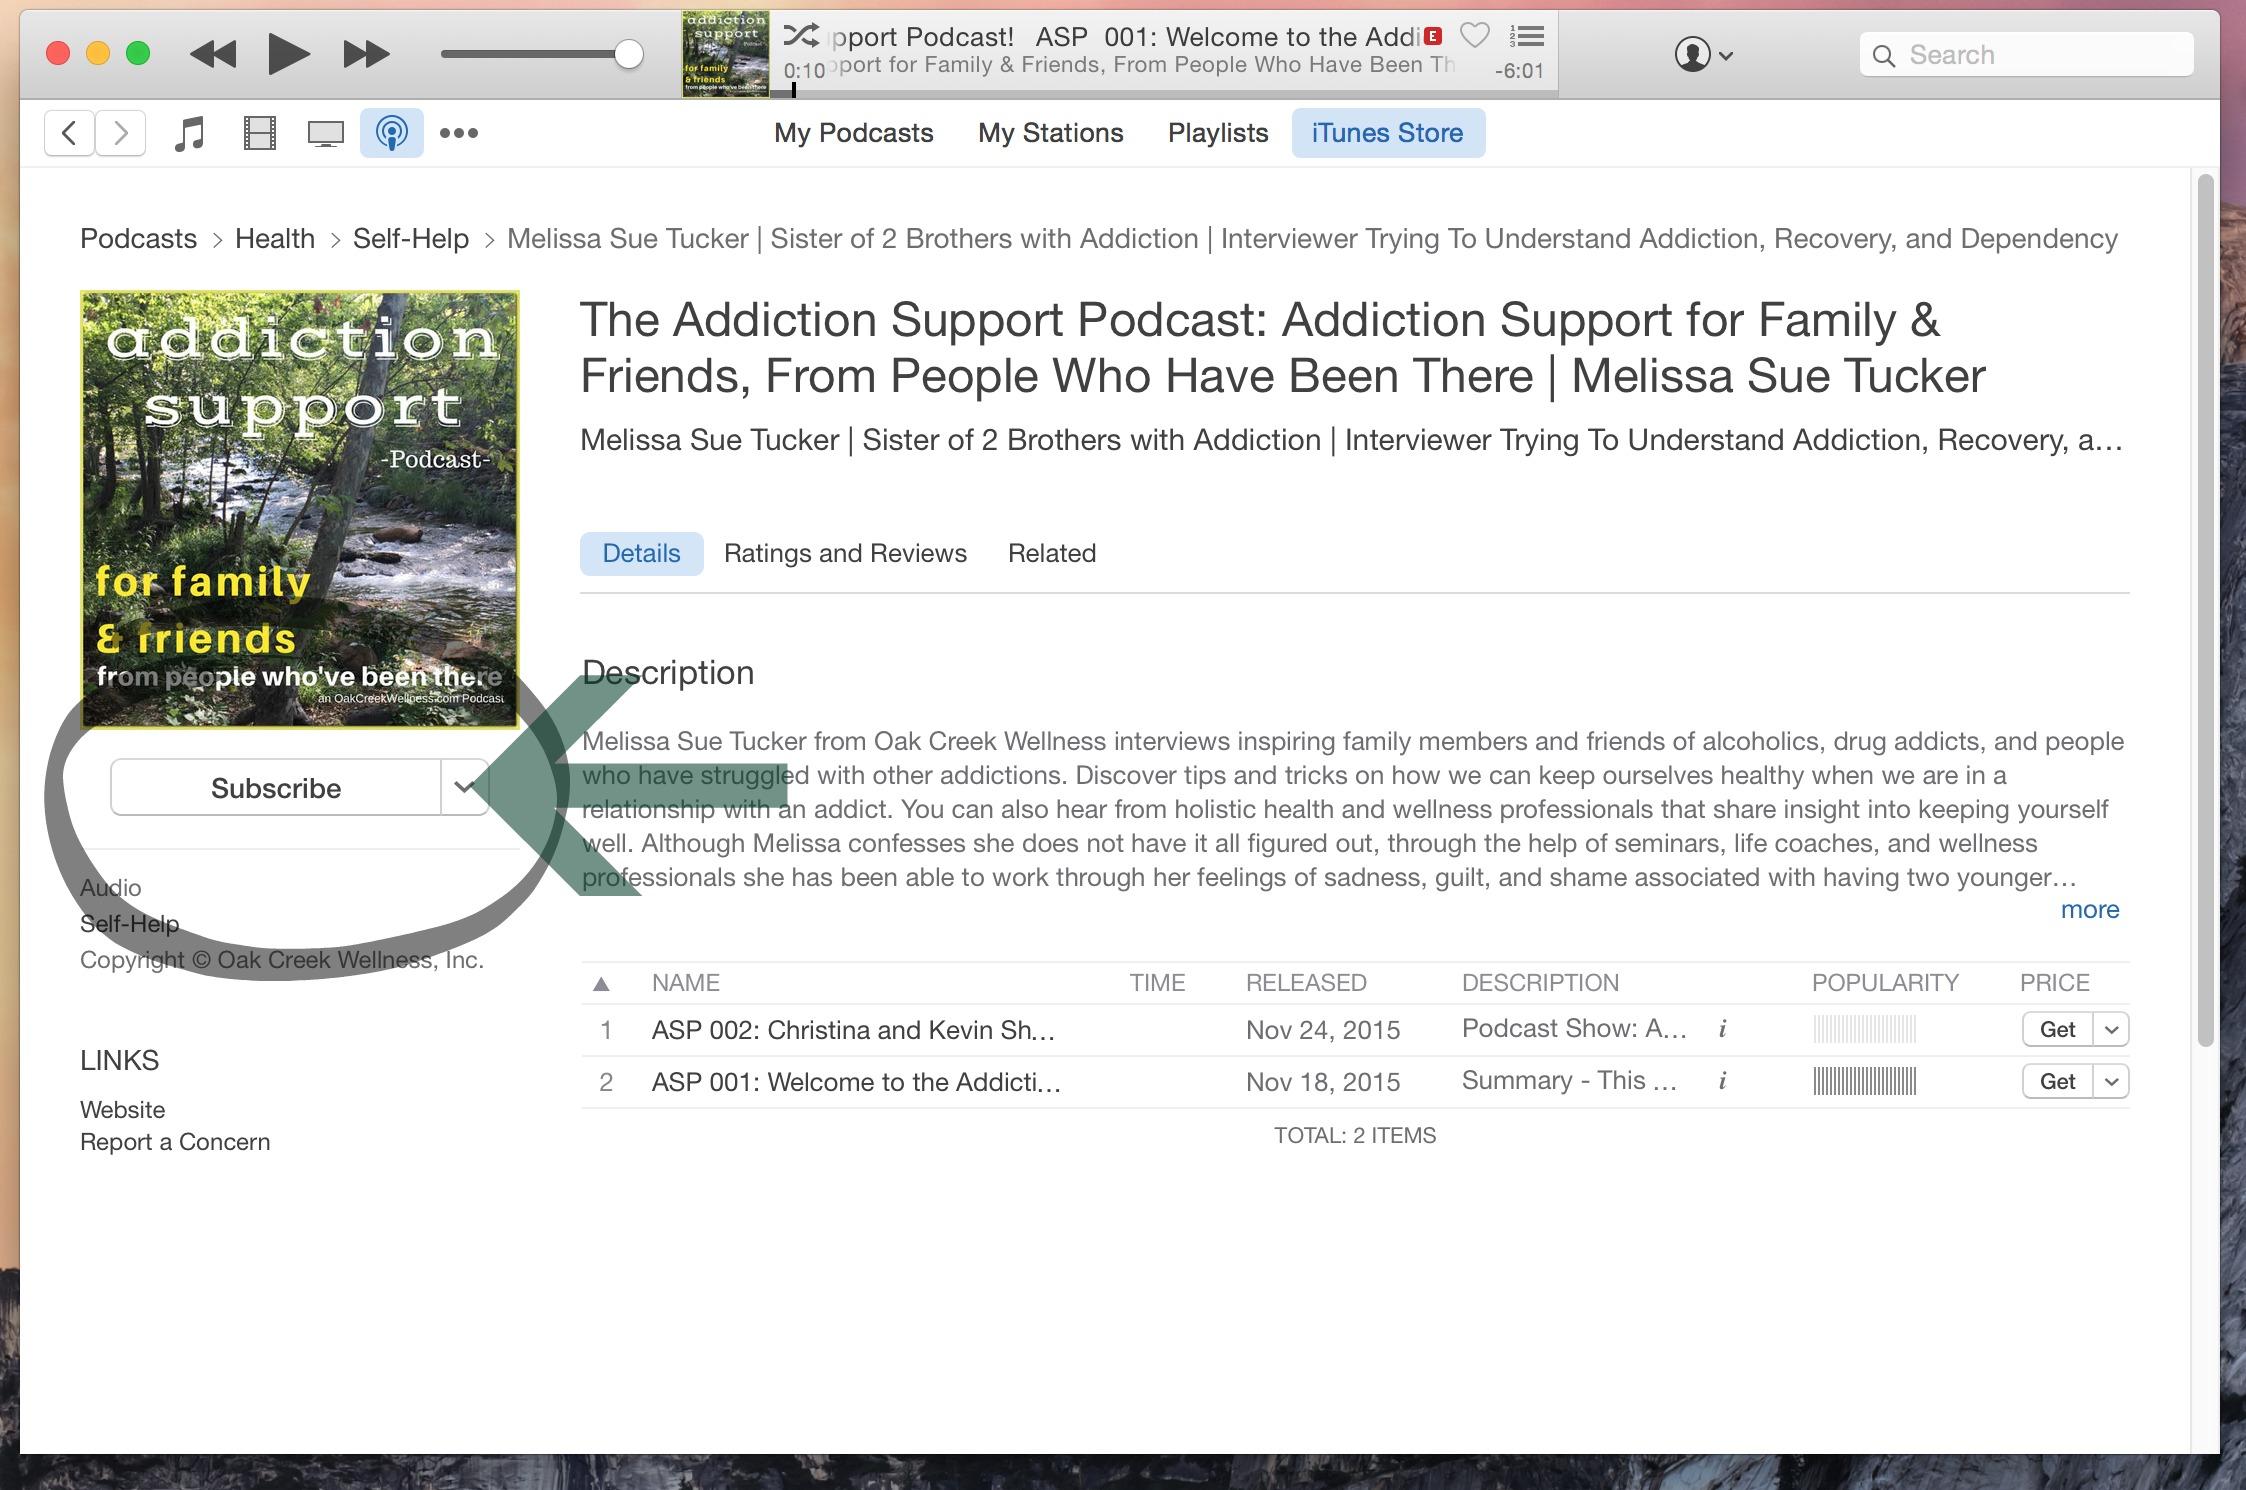 ASP iTunes Review 2